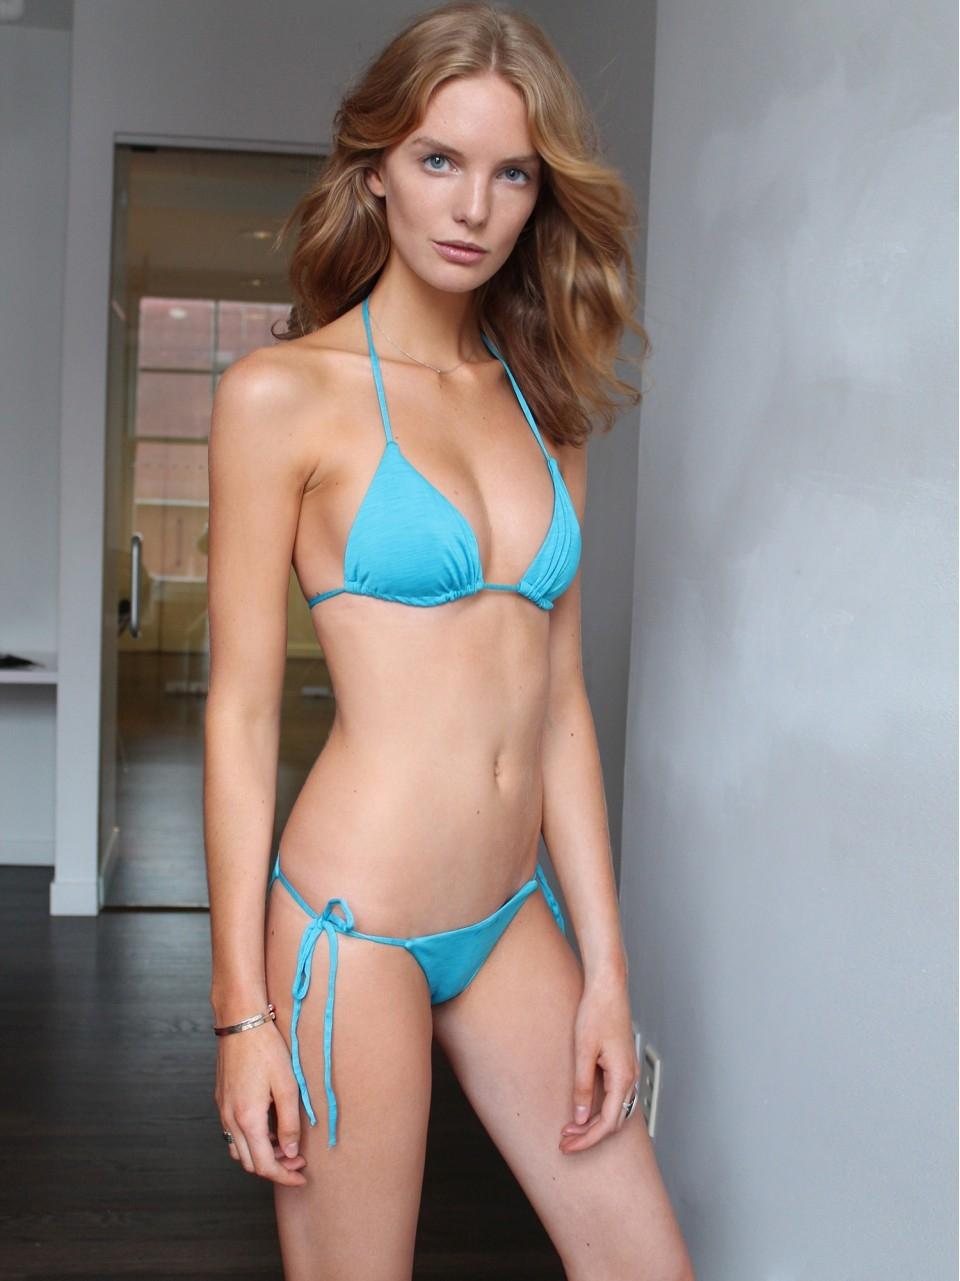 Selfie Lane Lindell nude (75 photo), Sexy, Hot, Boobs, bra 2020